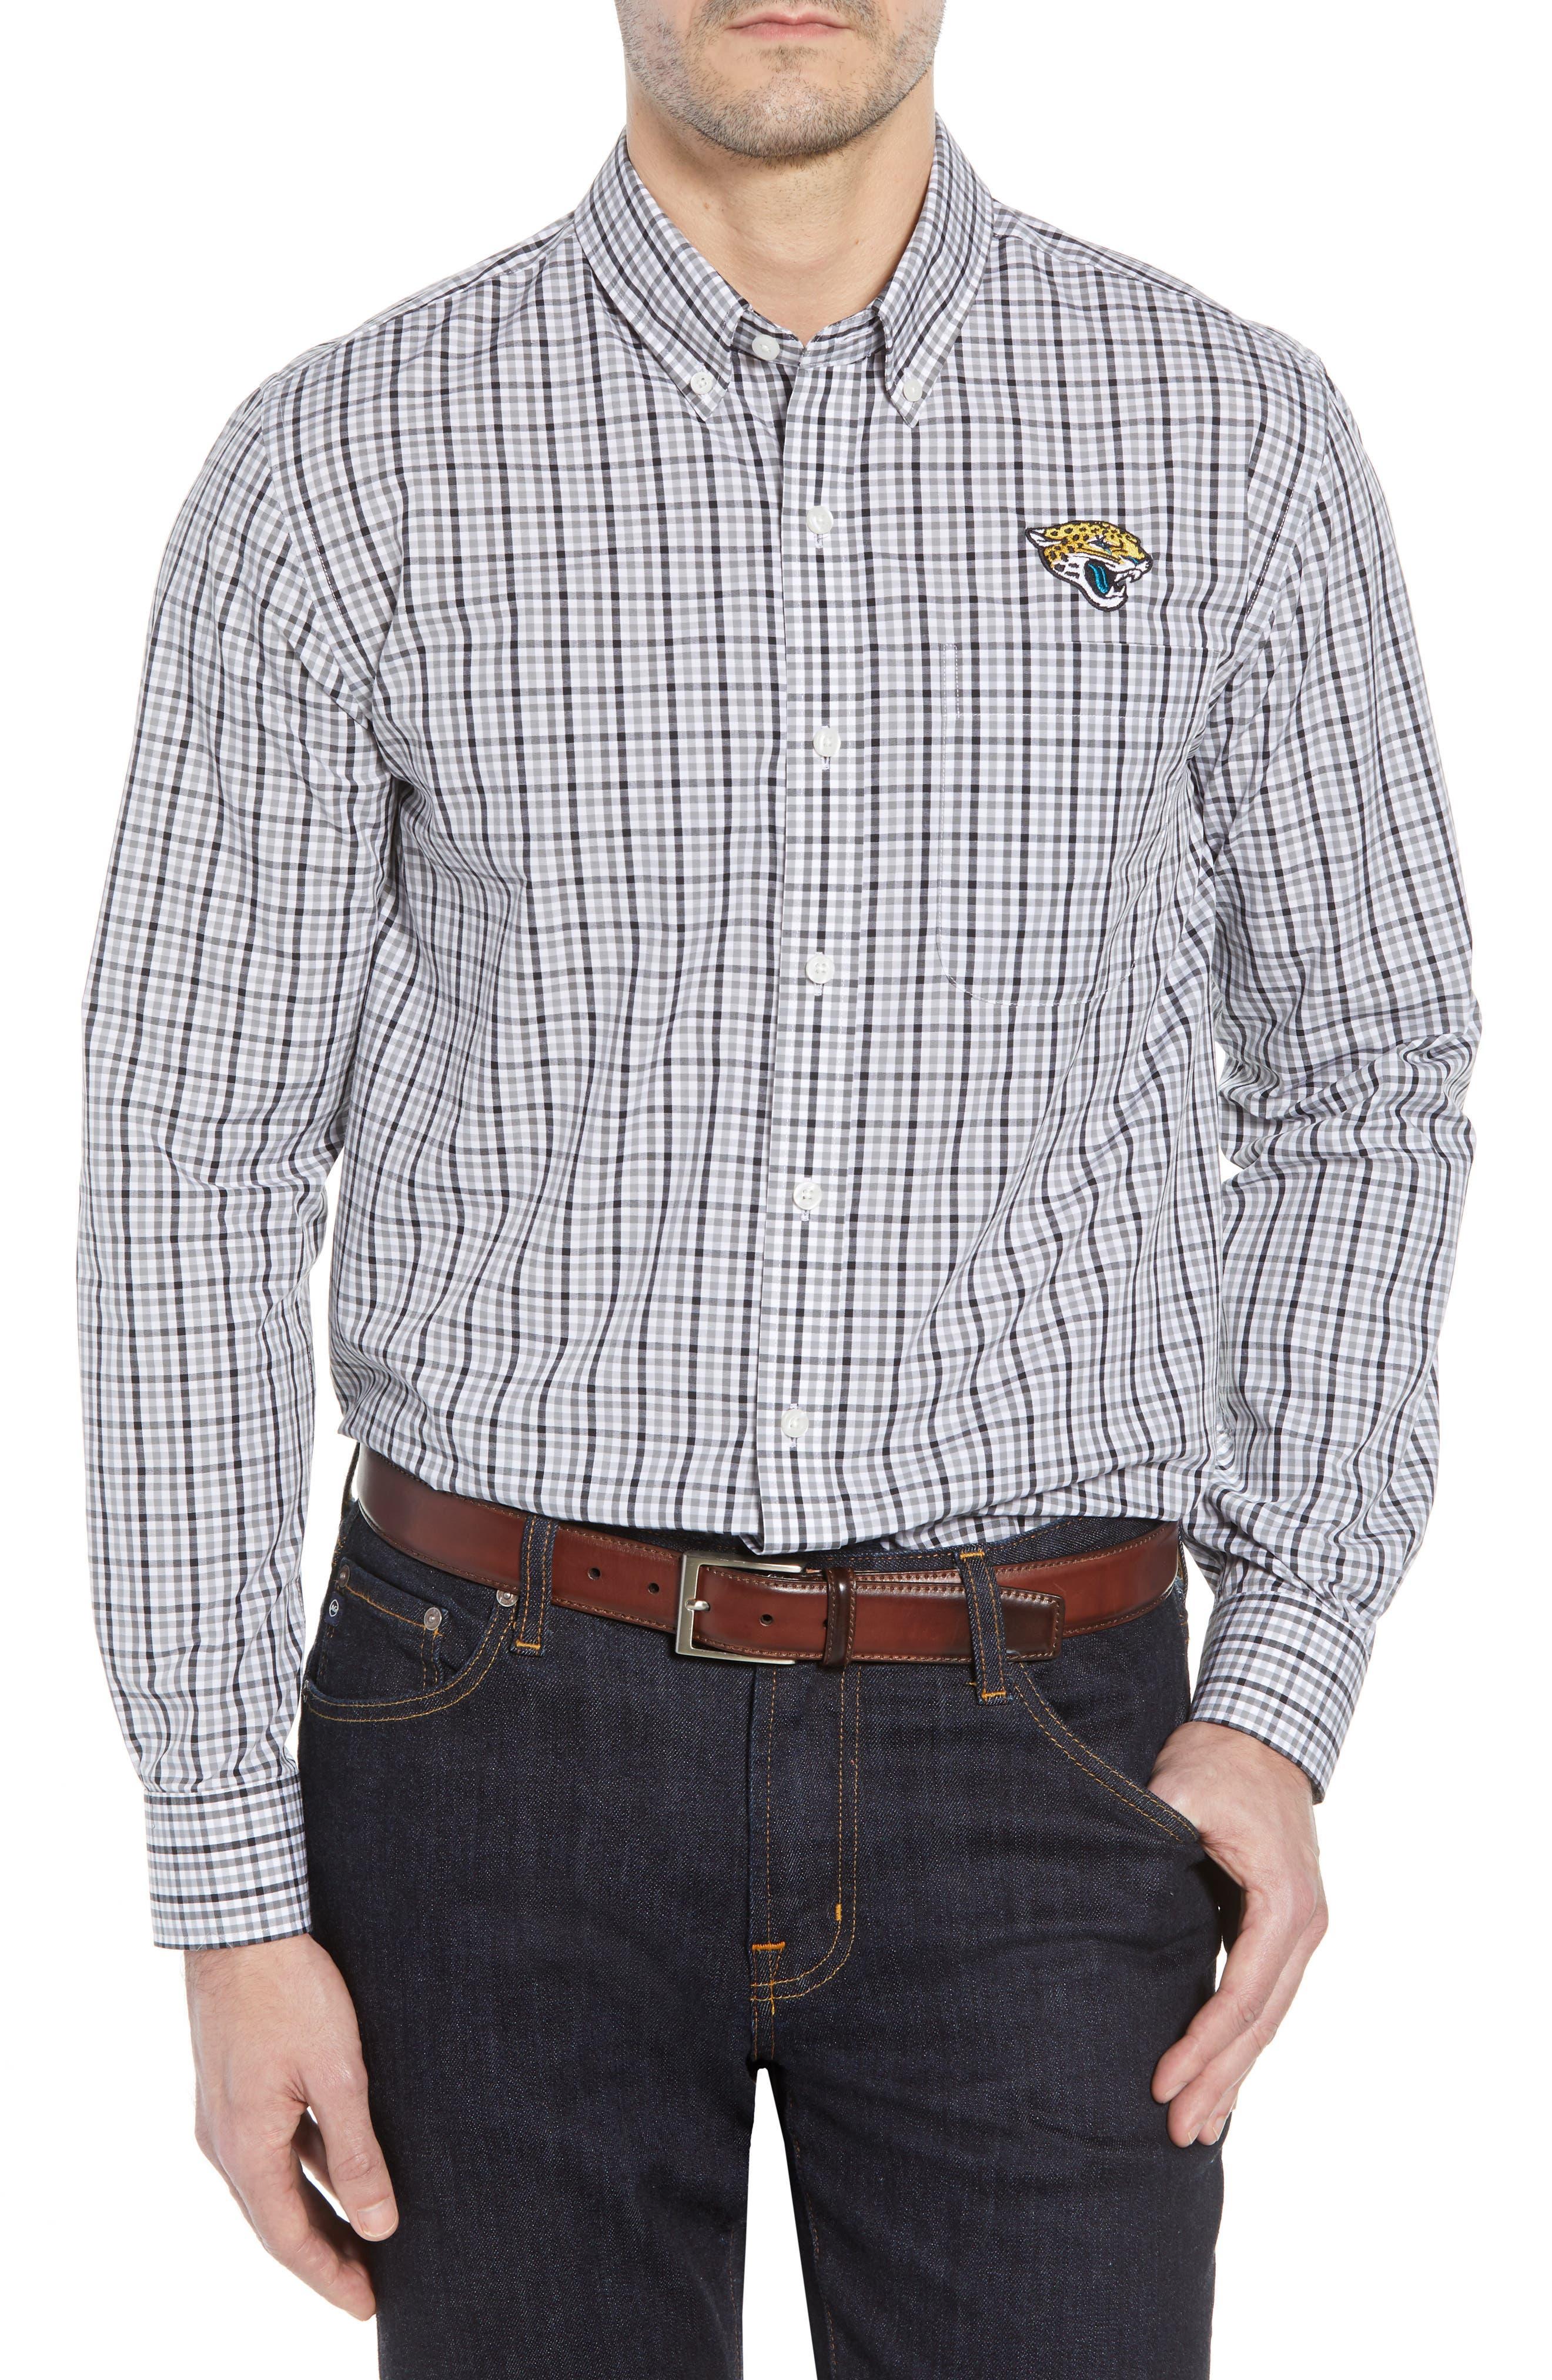 Jacksonville Jaguars - Gilman Regular Fit Plaid Sport Shirt,                             Main thumbnail 1, color,                             BLACK